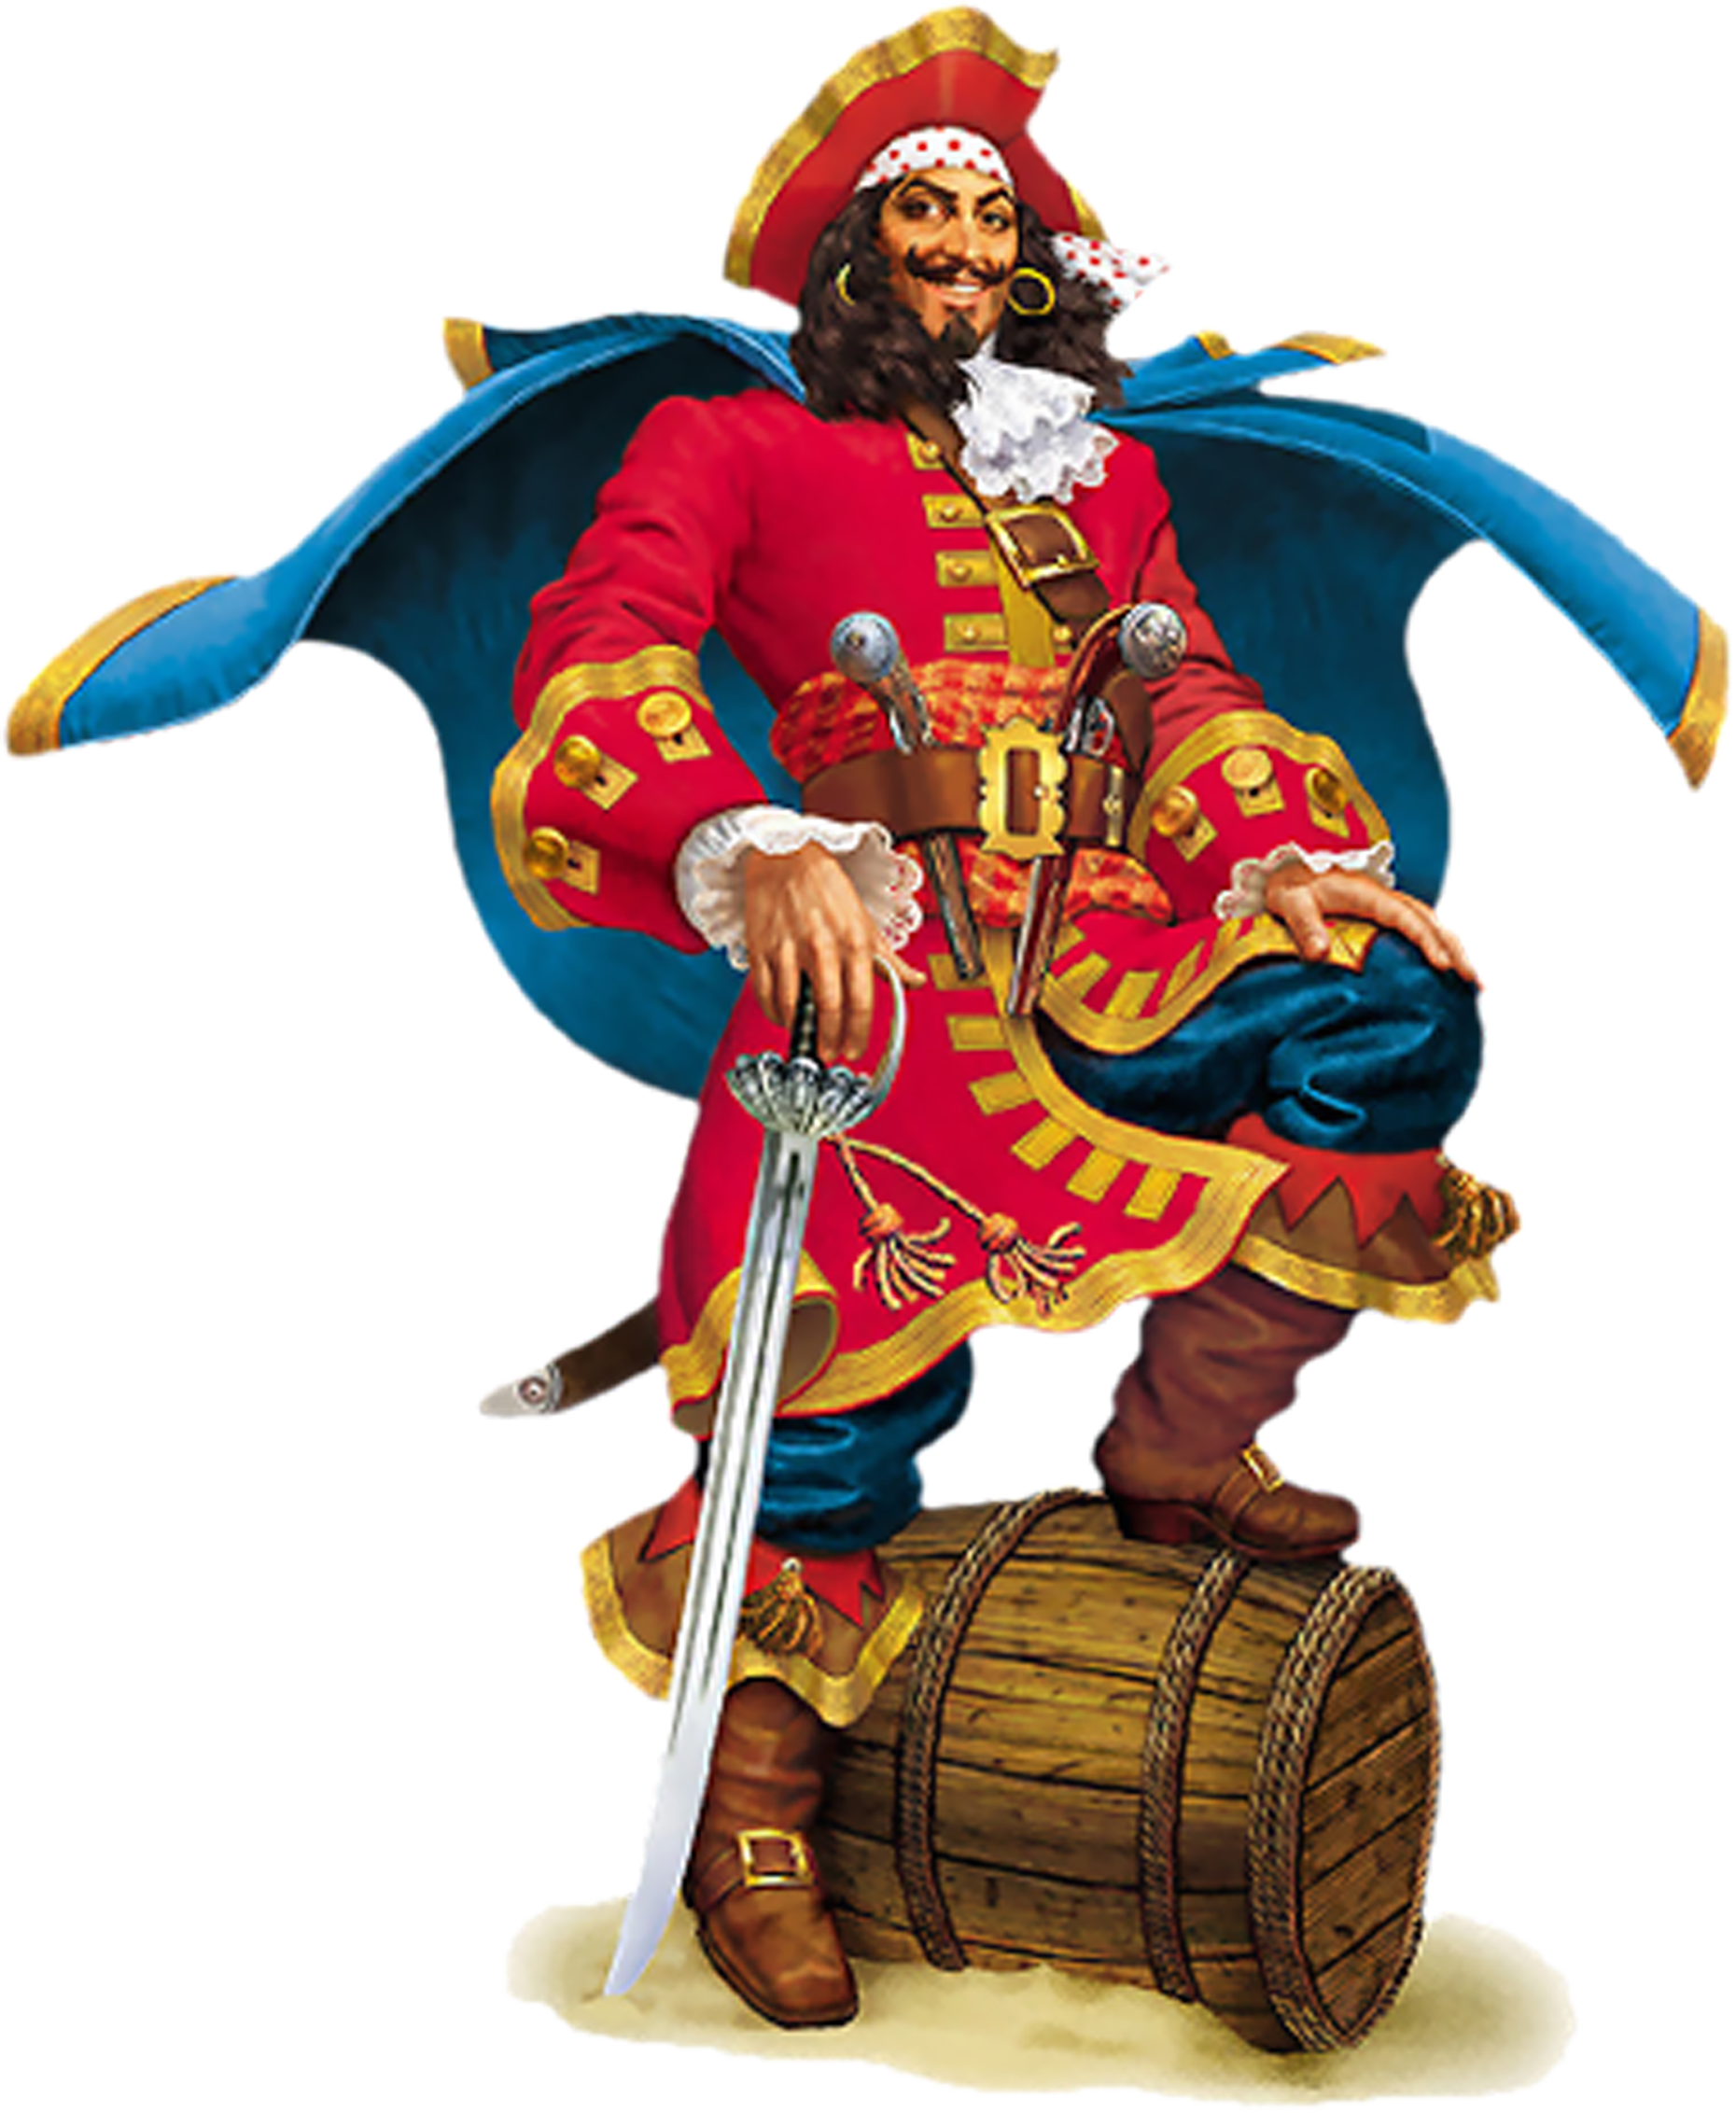 https://pngimg.com/uploads/pirate/pirate_PNG9.png